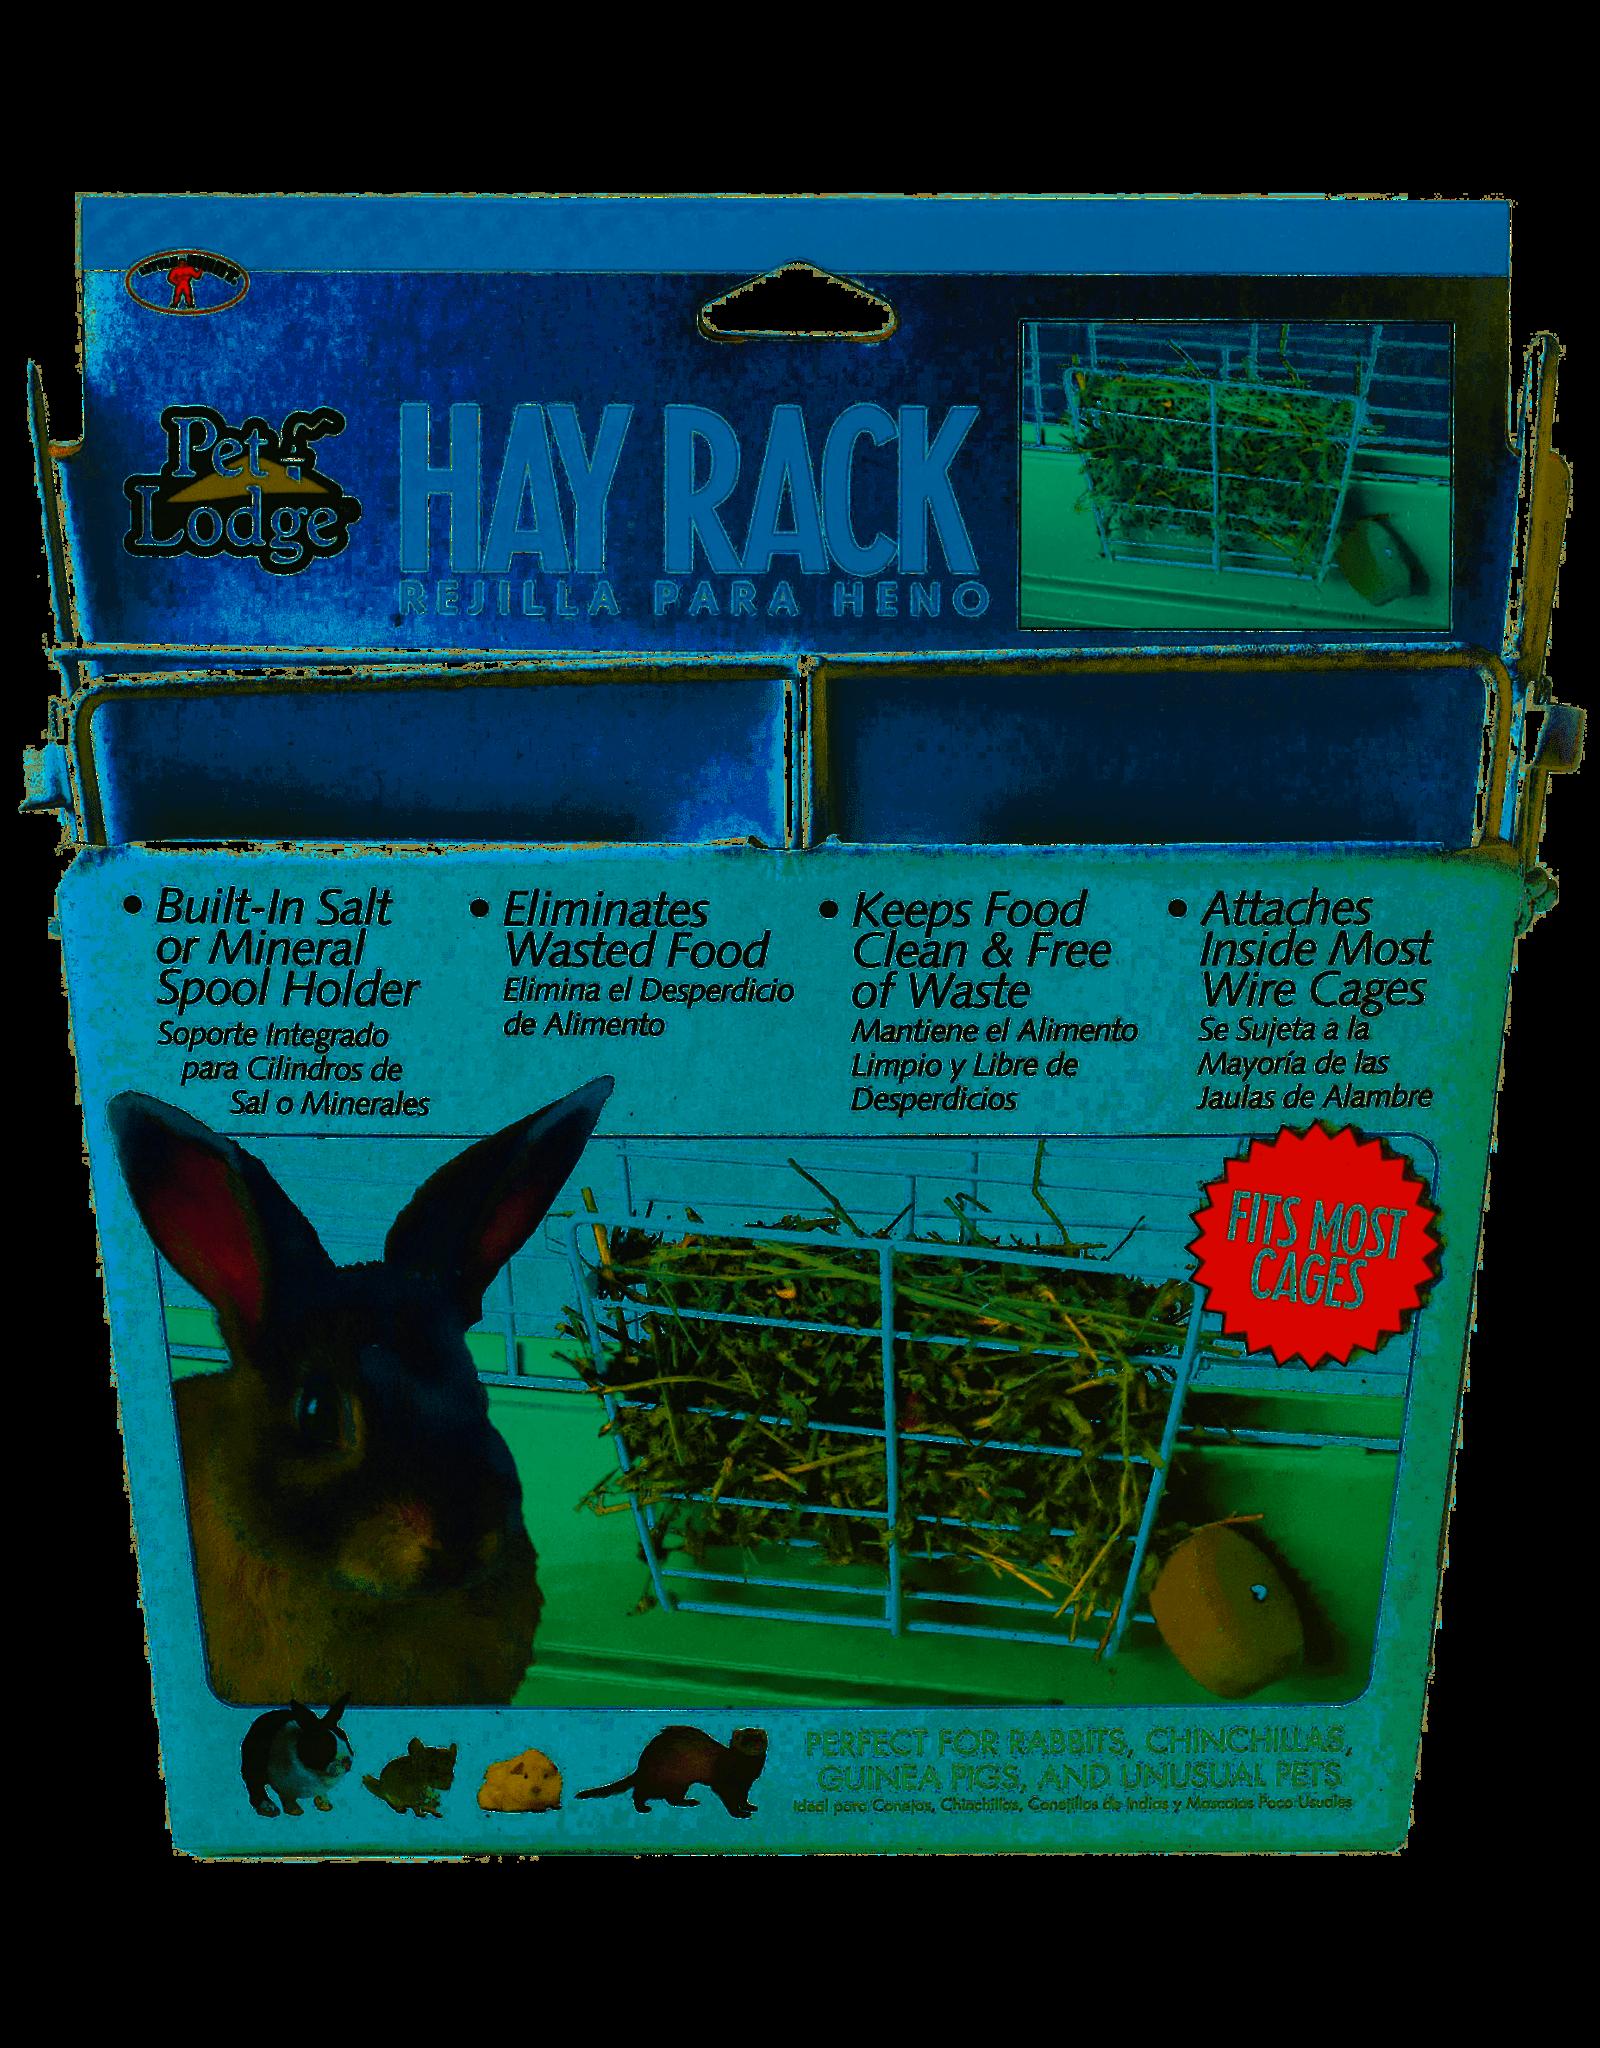 Pet Lodge Hay Rack for Rabbits